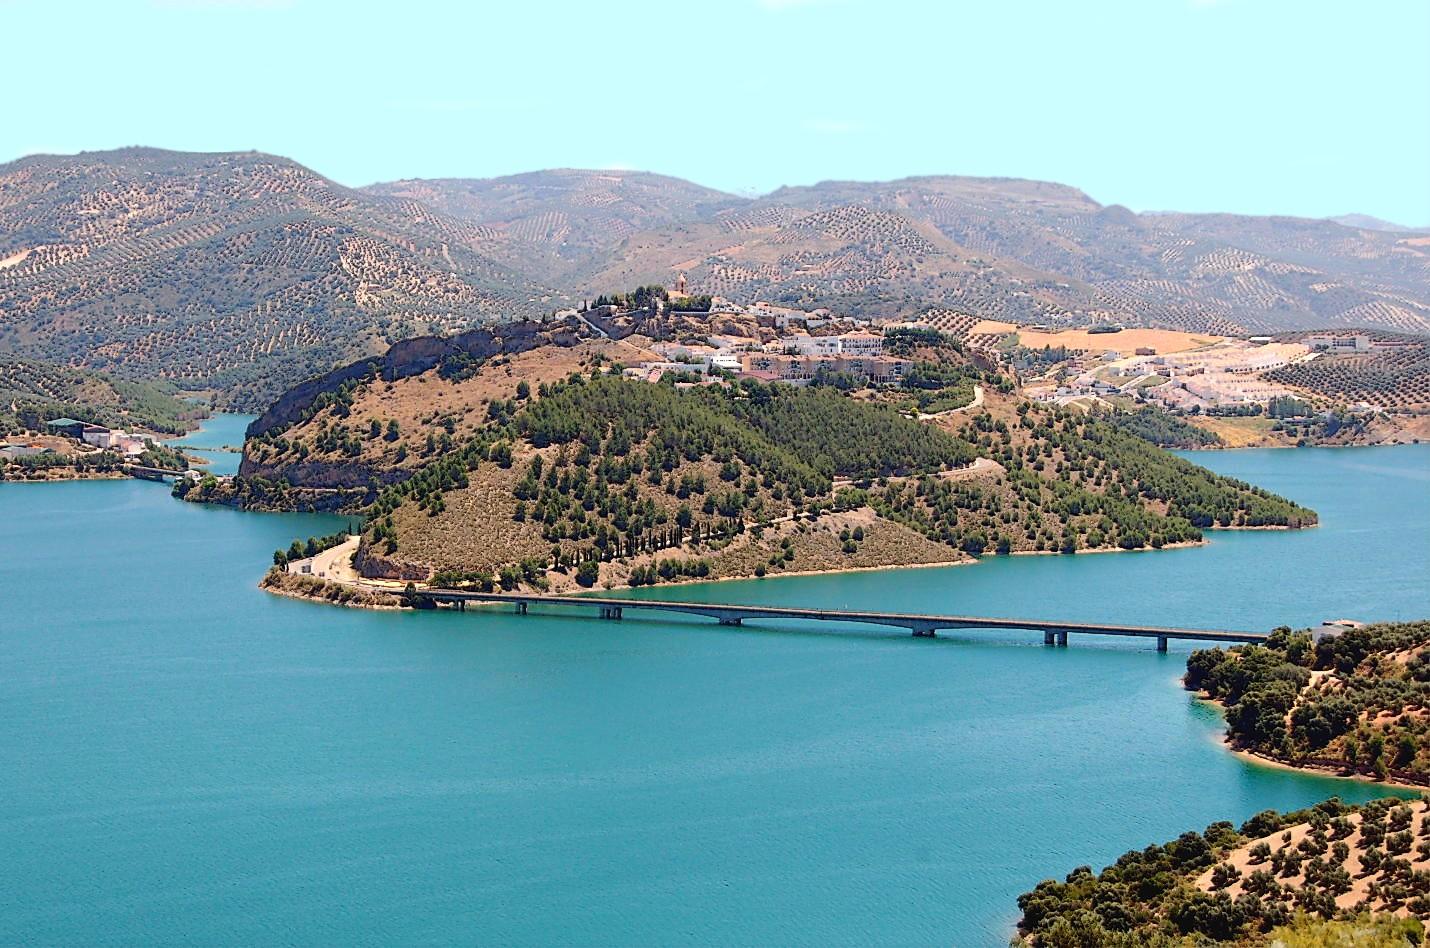 Las Antorchas, Iznajar: Lake Views for Reform